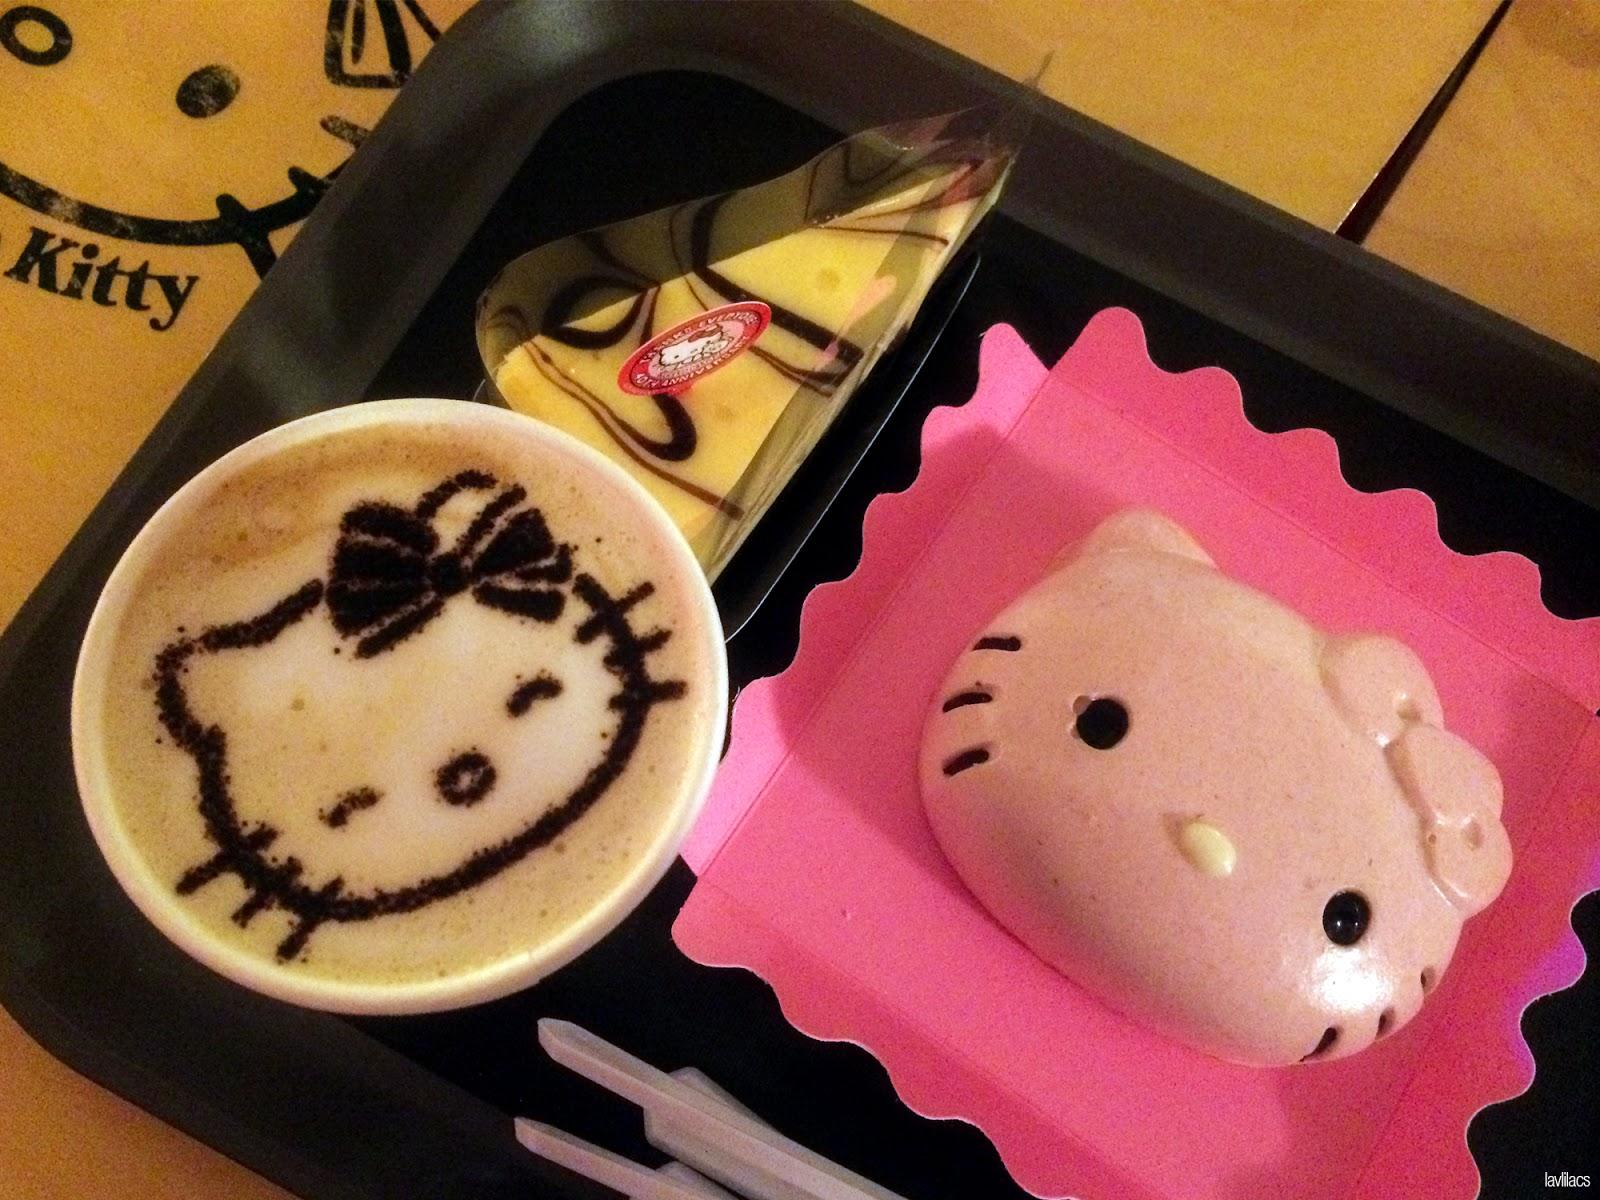 Seoul, Korea - Summer Study Abroad 2014 - Hongdae Hello Kitty Cafe food and drink